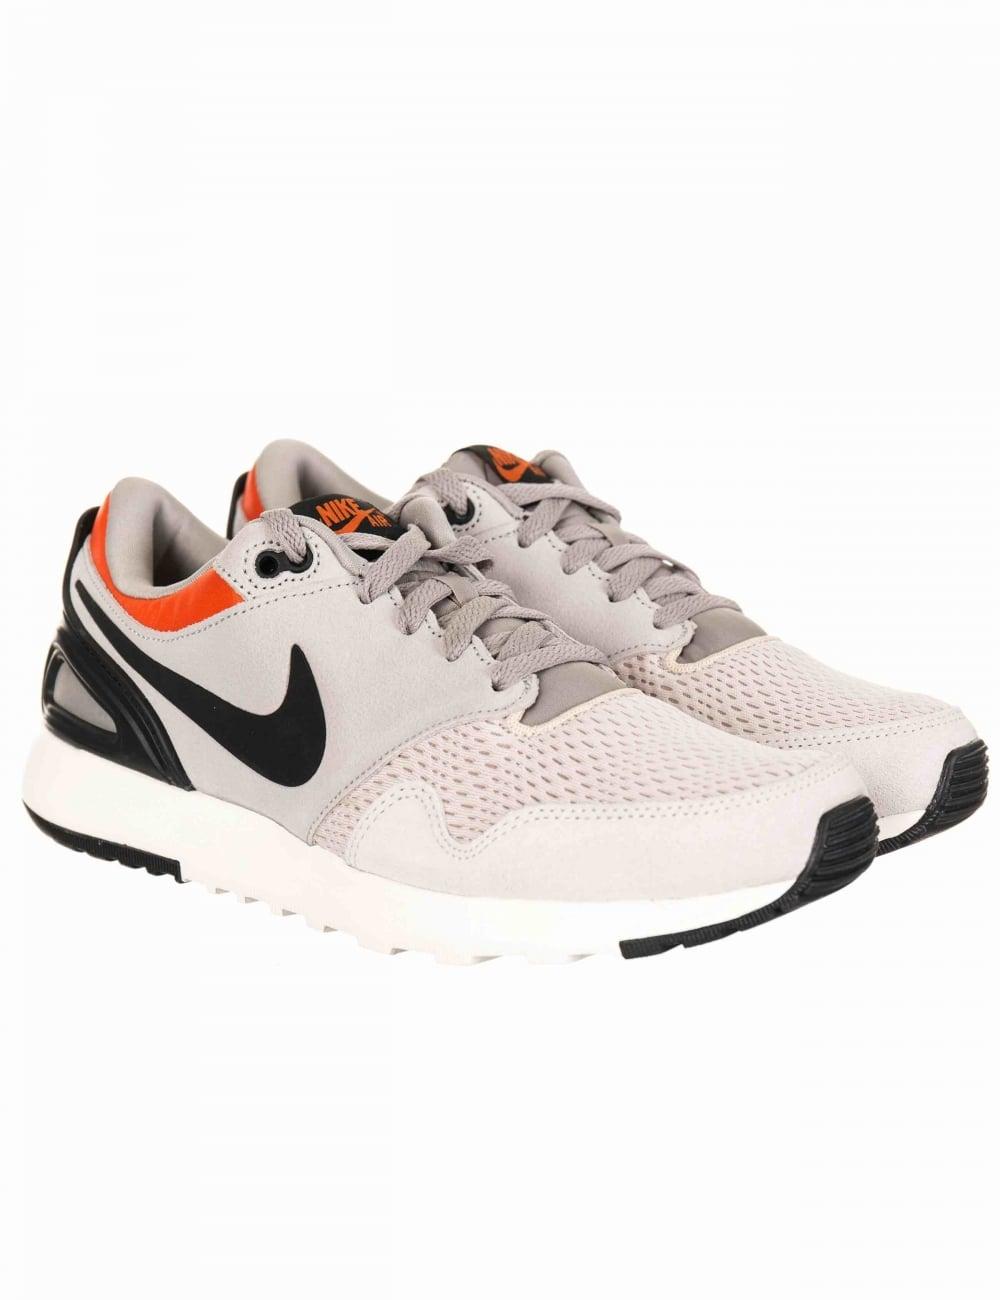 Air Vibenna SE Shoes - Lt Orewood Brown